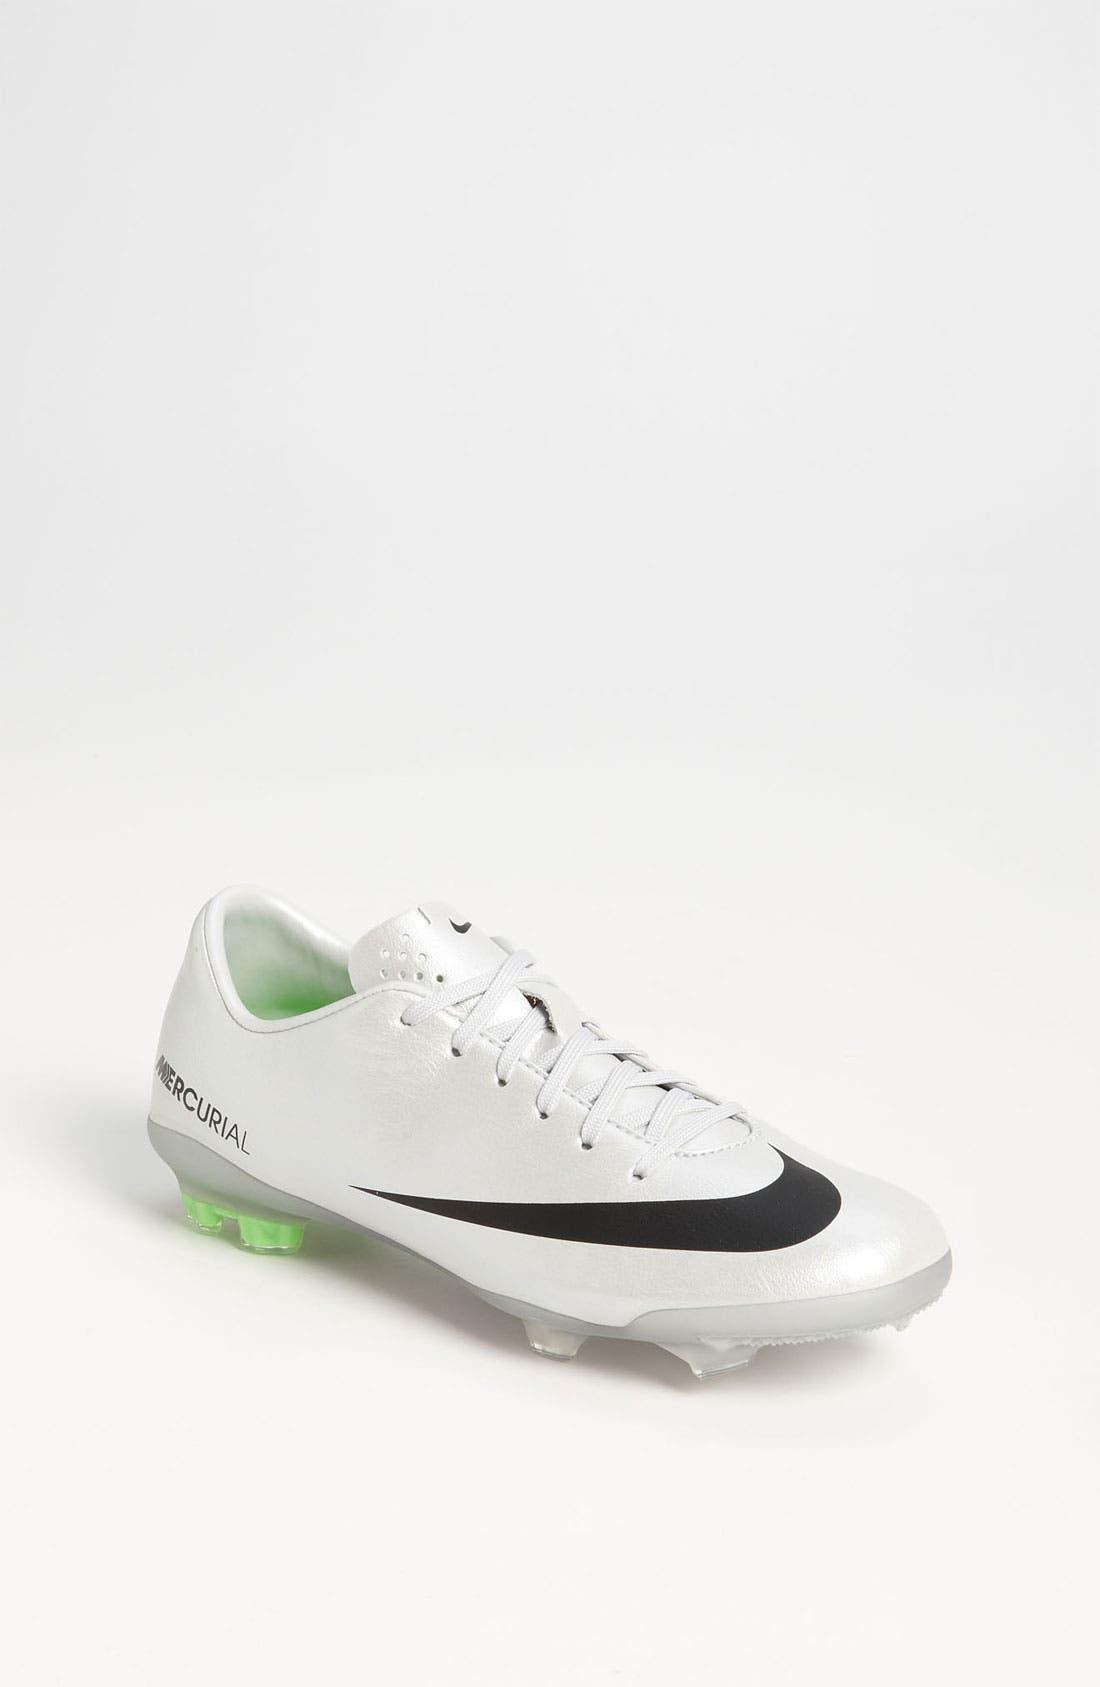 Main Image - Nike 'Jr. Mercurial Vapor' Soccer Cleat (Little Kid & Big Kid)